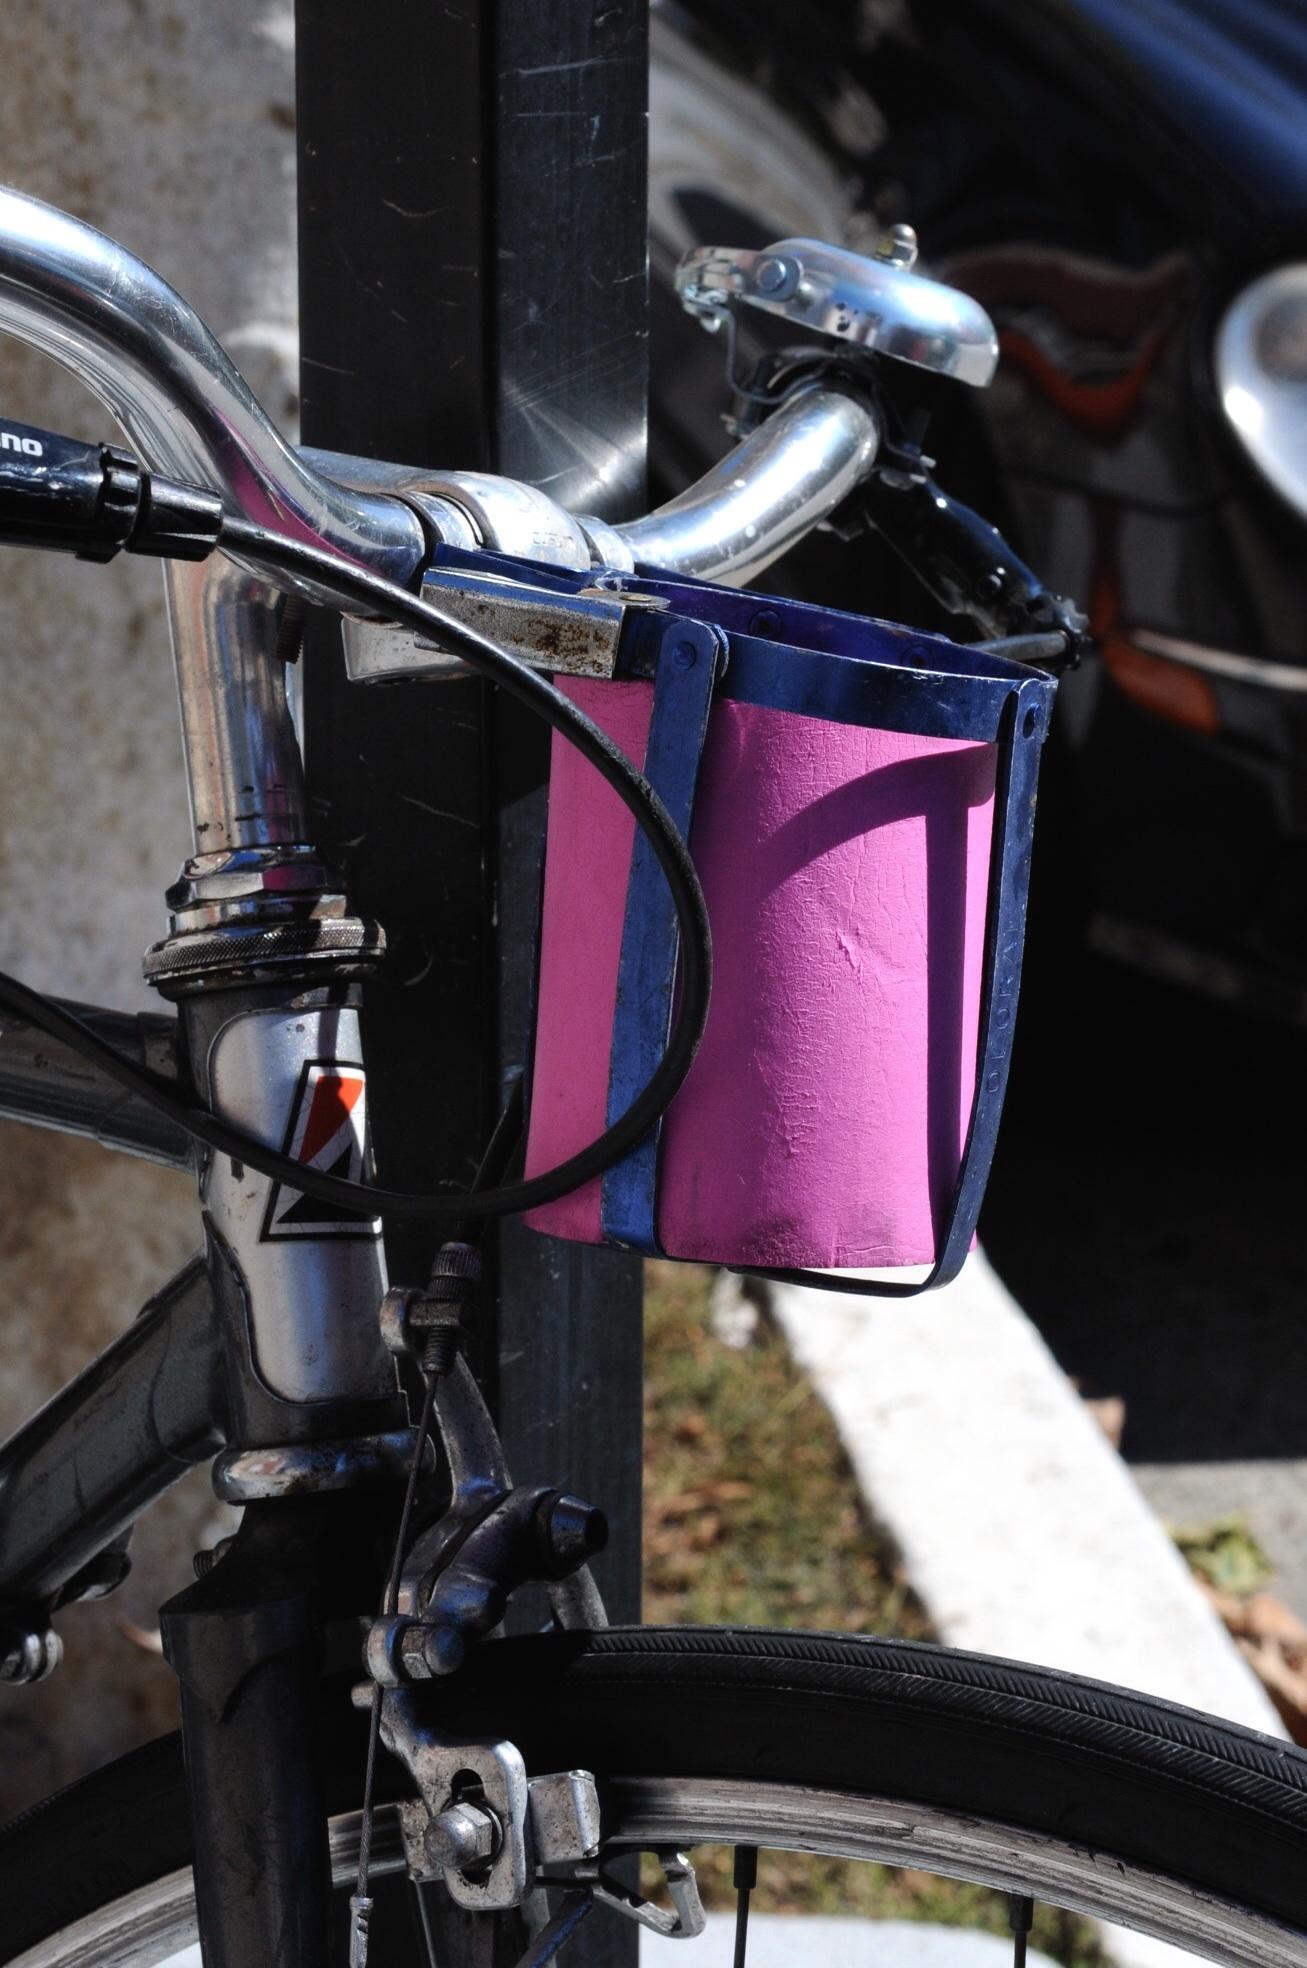 Getränkehalter am Lenker des Fahrrads